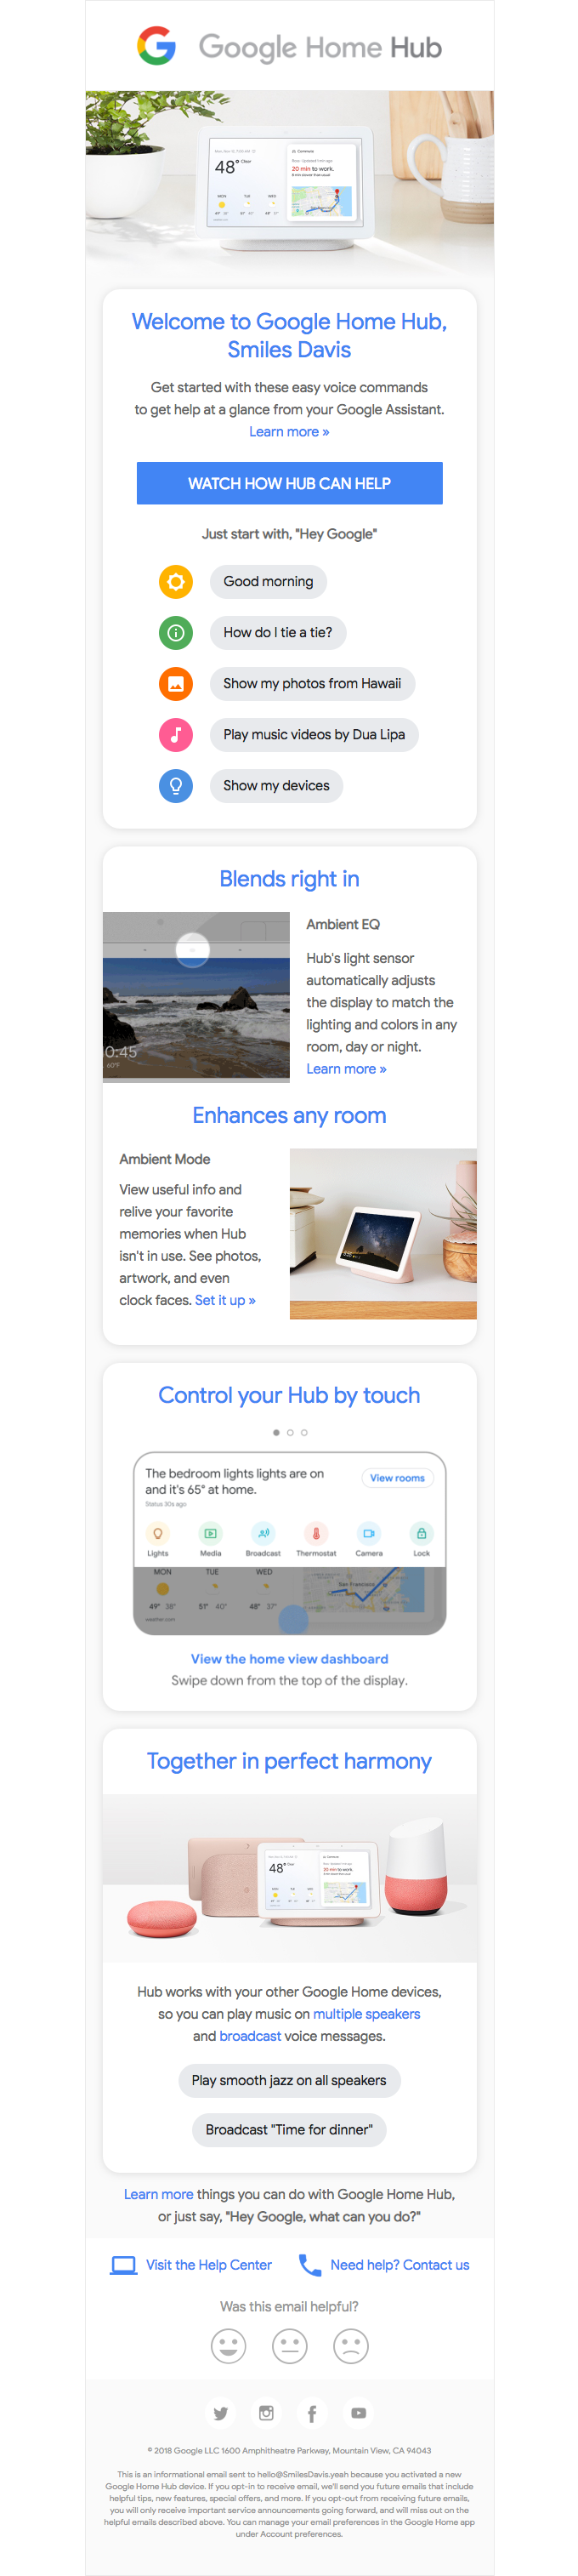 Smiles Davis, welcome to your Google Home Hub